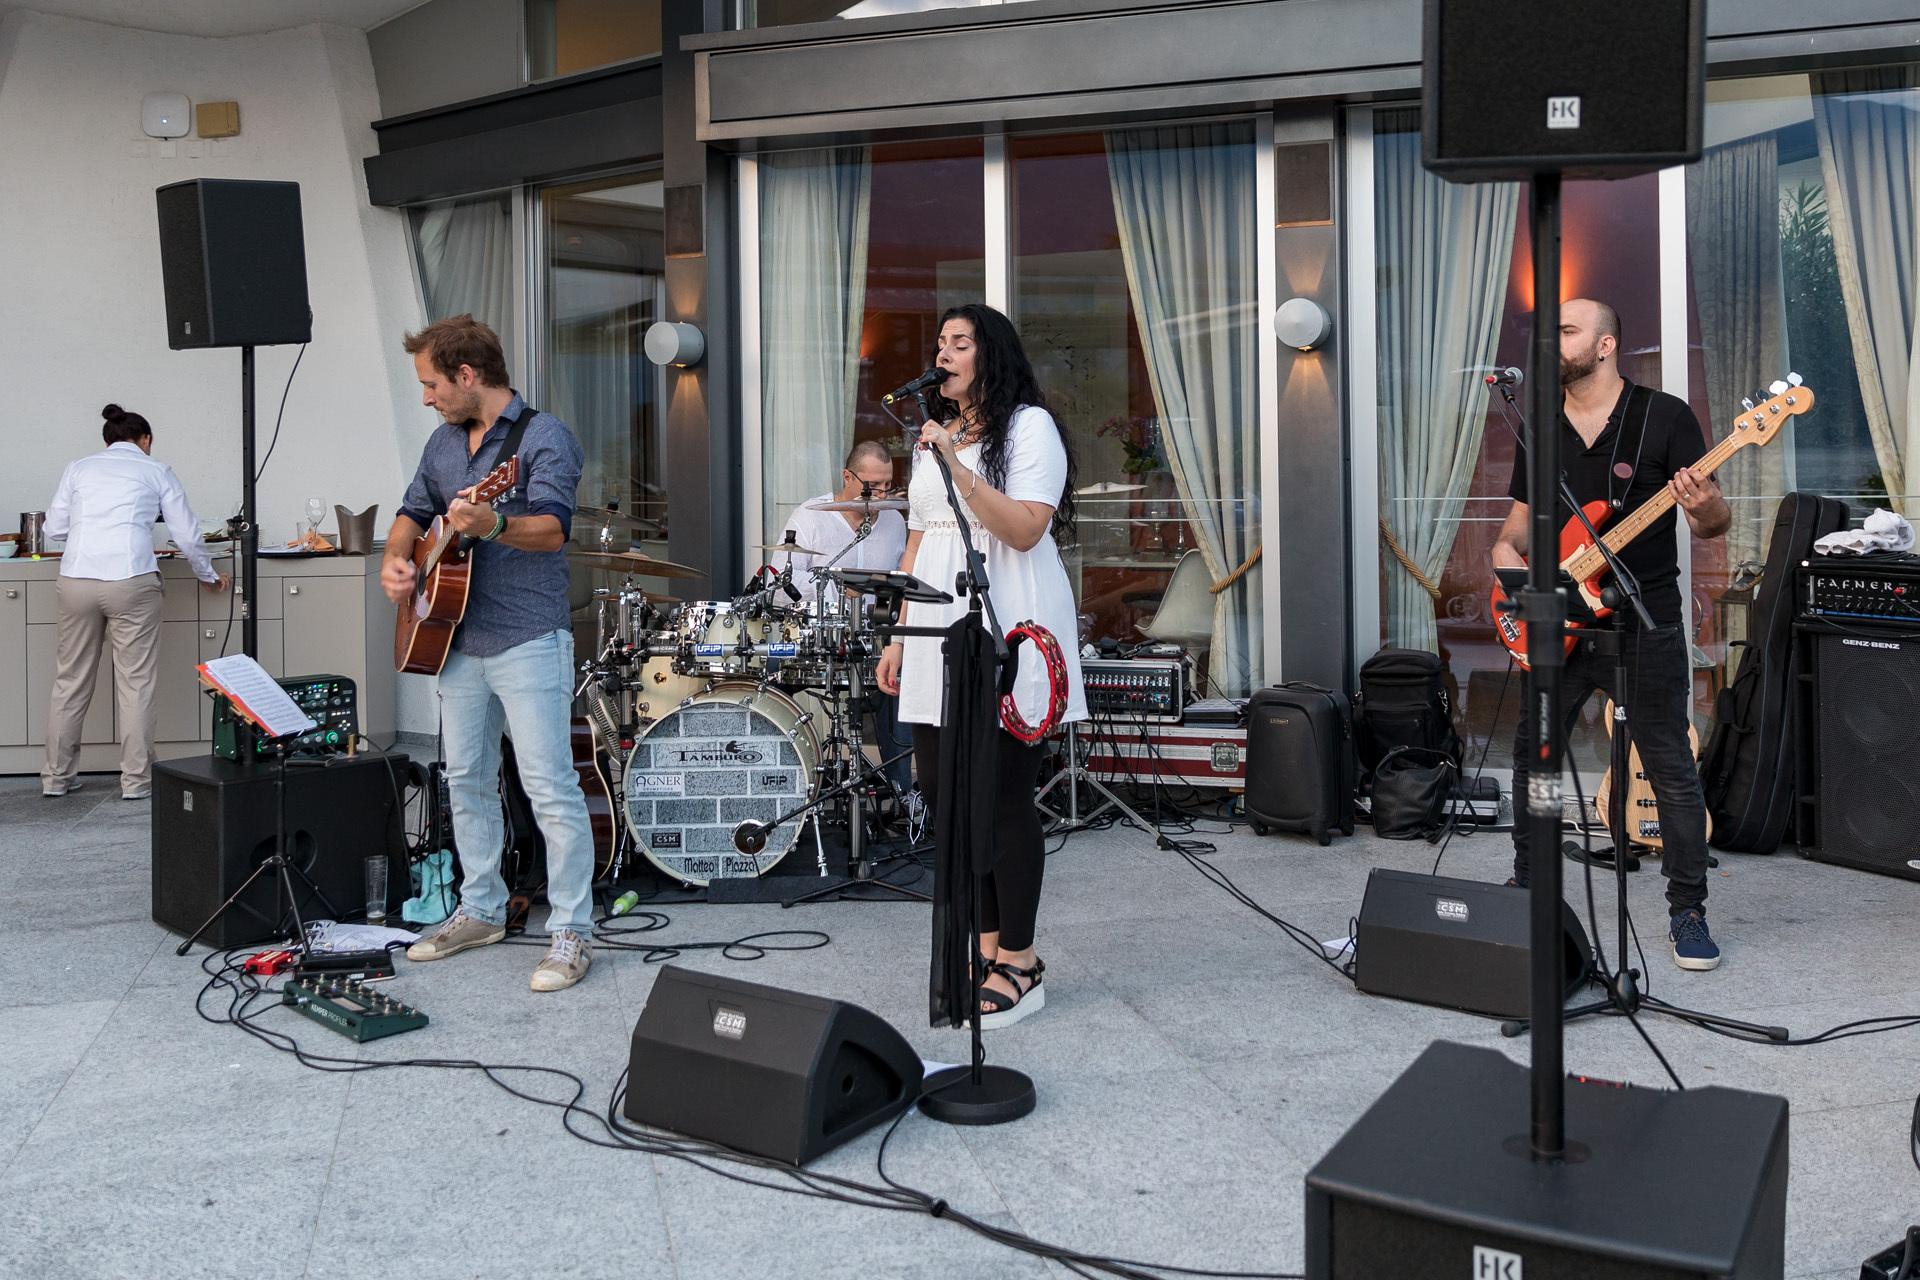 2018_08_18-Ascona-Jazz-Night-©-Luca-Vantusso-5D4A2373